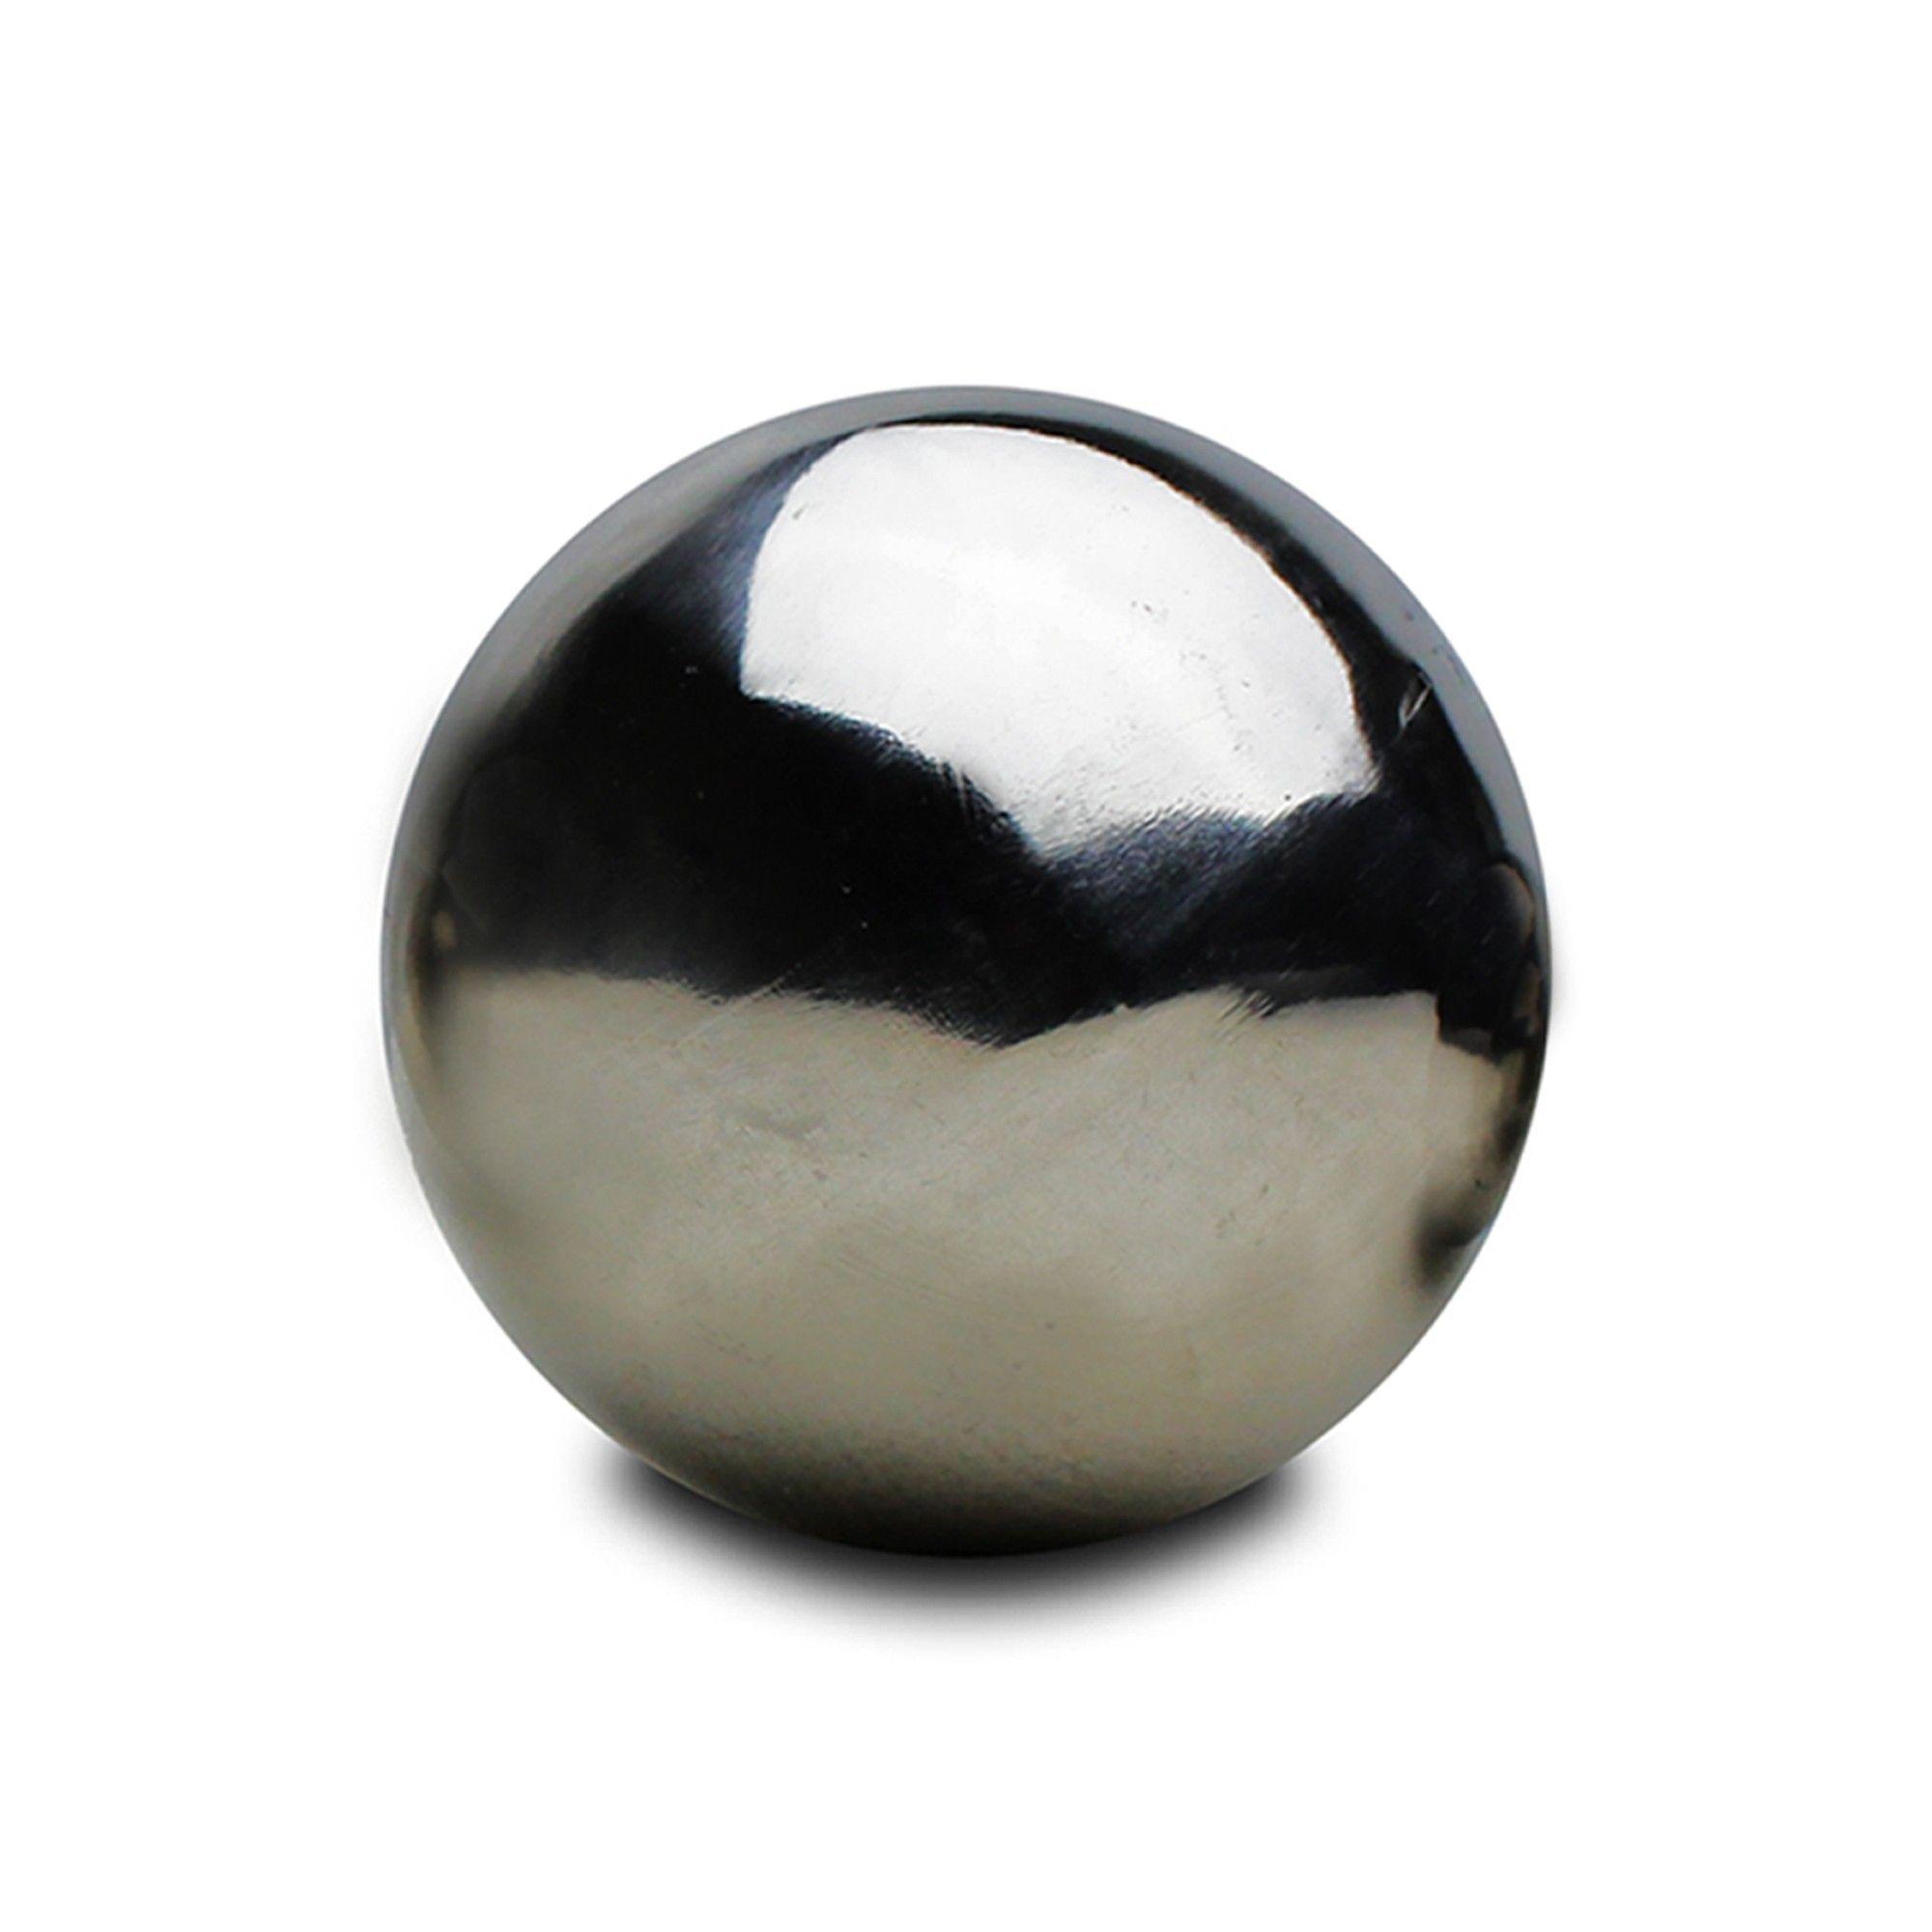 Stainless steel ornaments - Brass Sphere Google Search Garden Featuresgarden Ornamentsstainless Steelmirrorsbrasstexturematerial